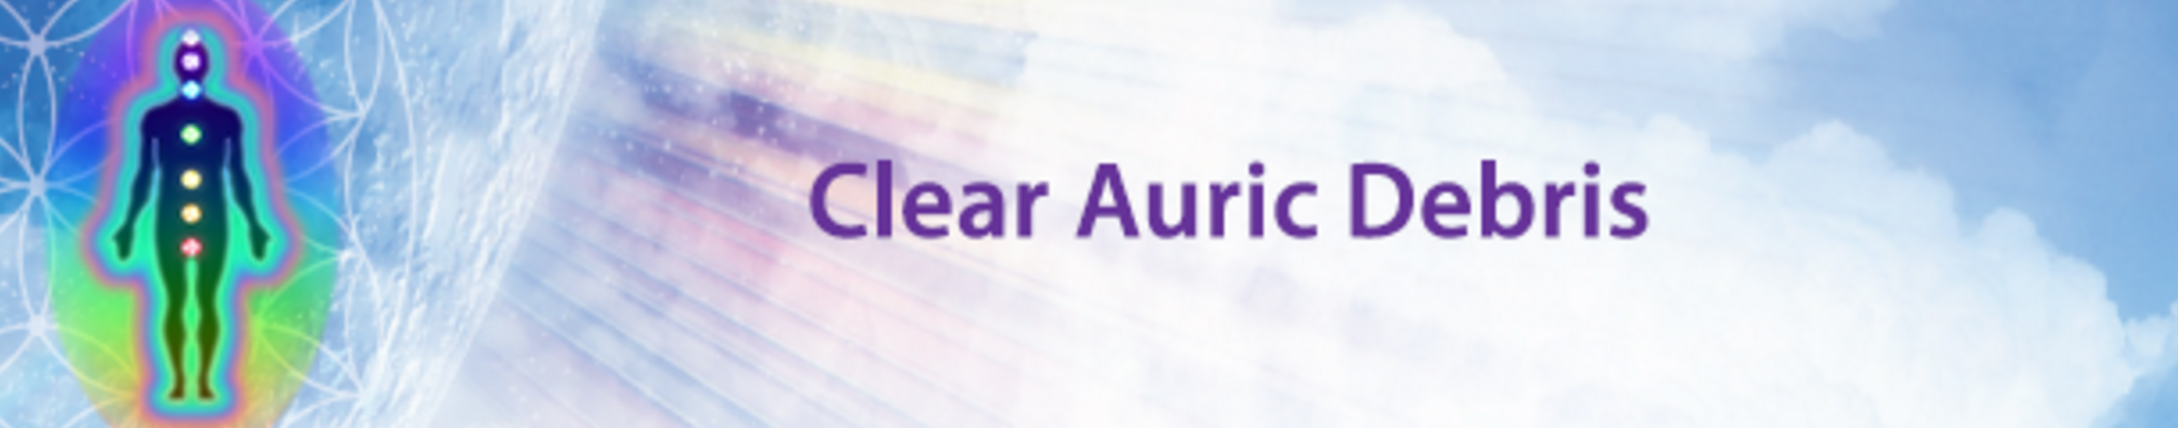 Video2-ClearAuricDebris.jpg